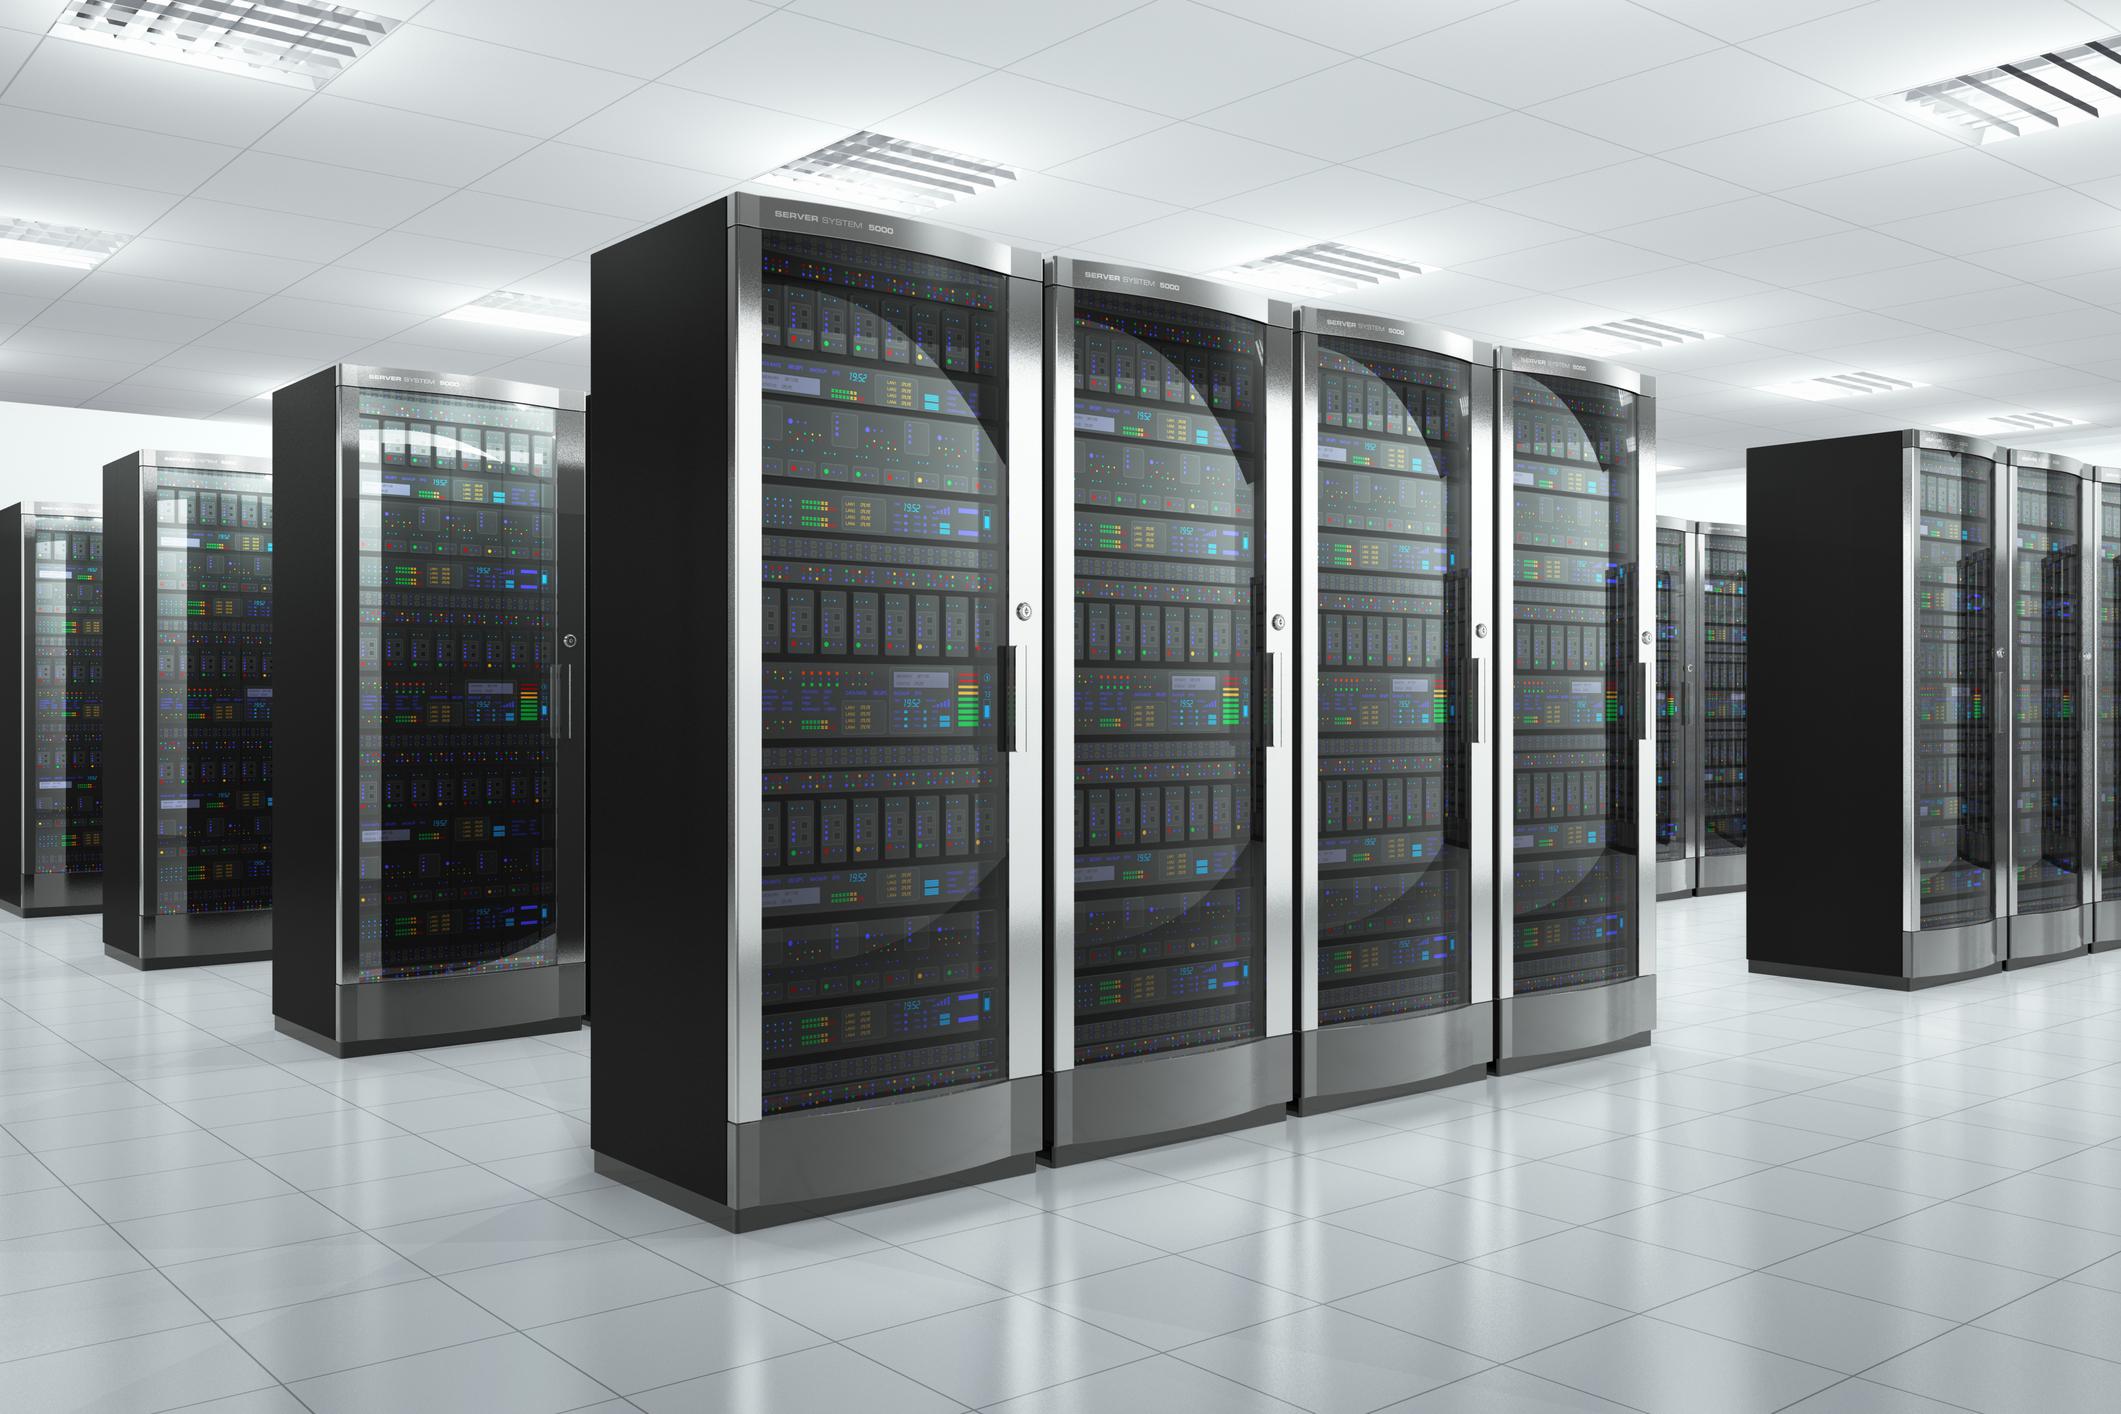 Data-center floor with several rows of server racks